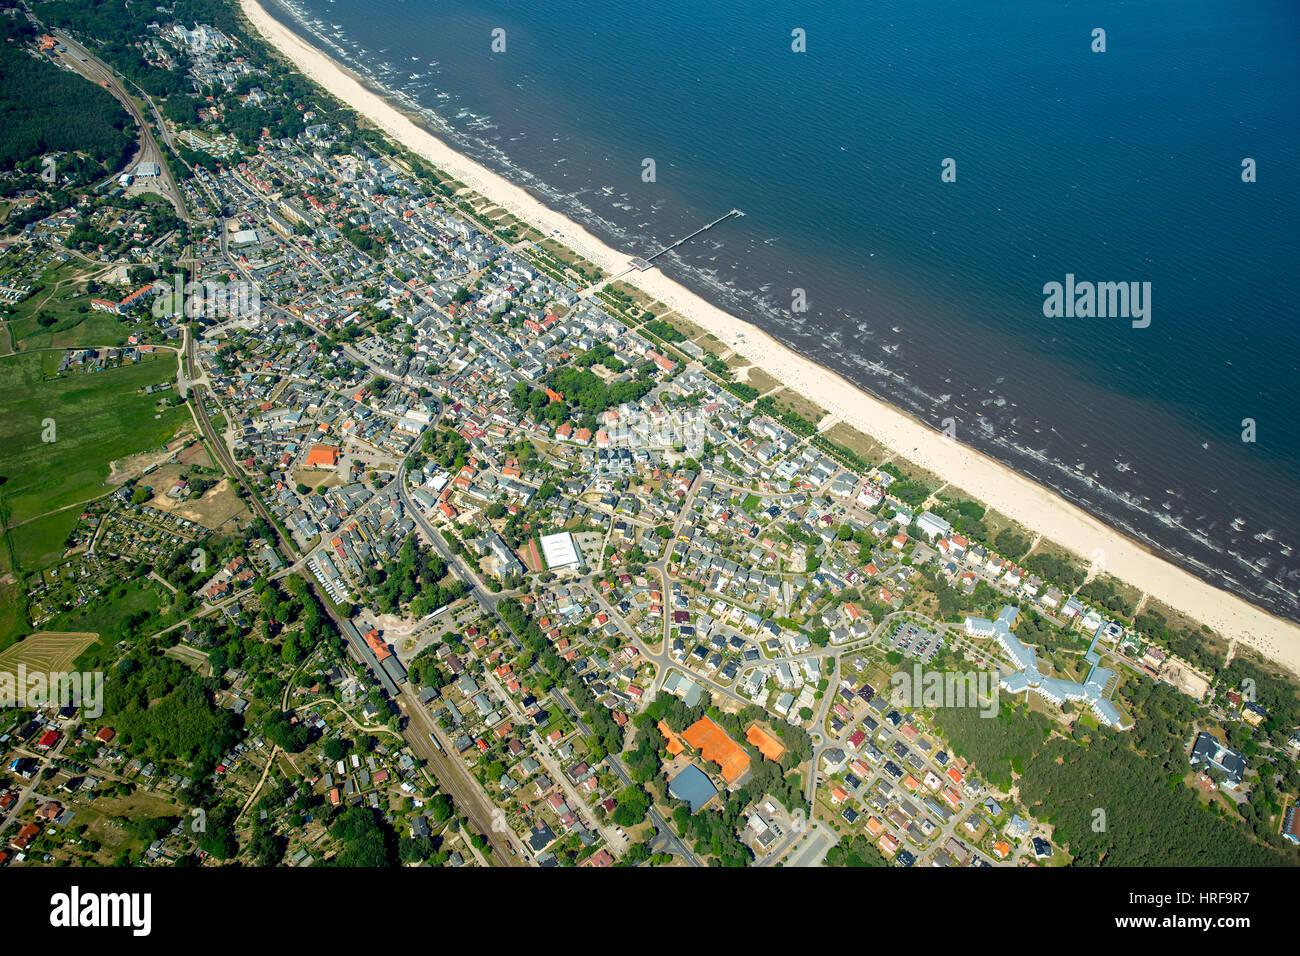 Seaside resort Ahlbeck with beach, Heringsdorf, Usedom Island, Baltic Sea, Mecklenburg-Western Pomerania, Germany - Stock Image